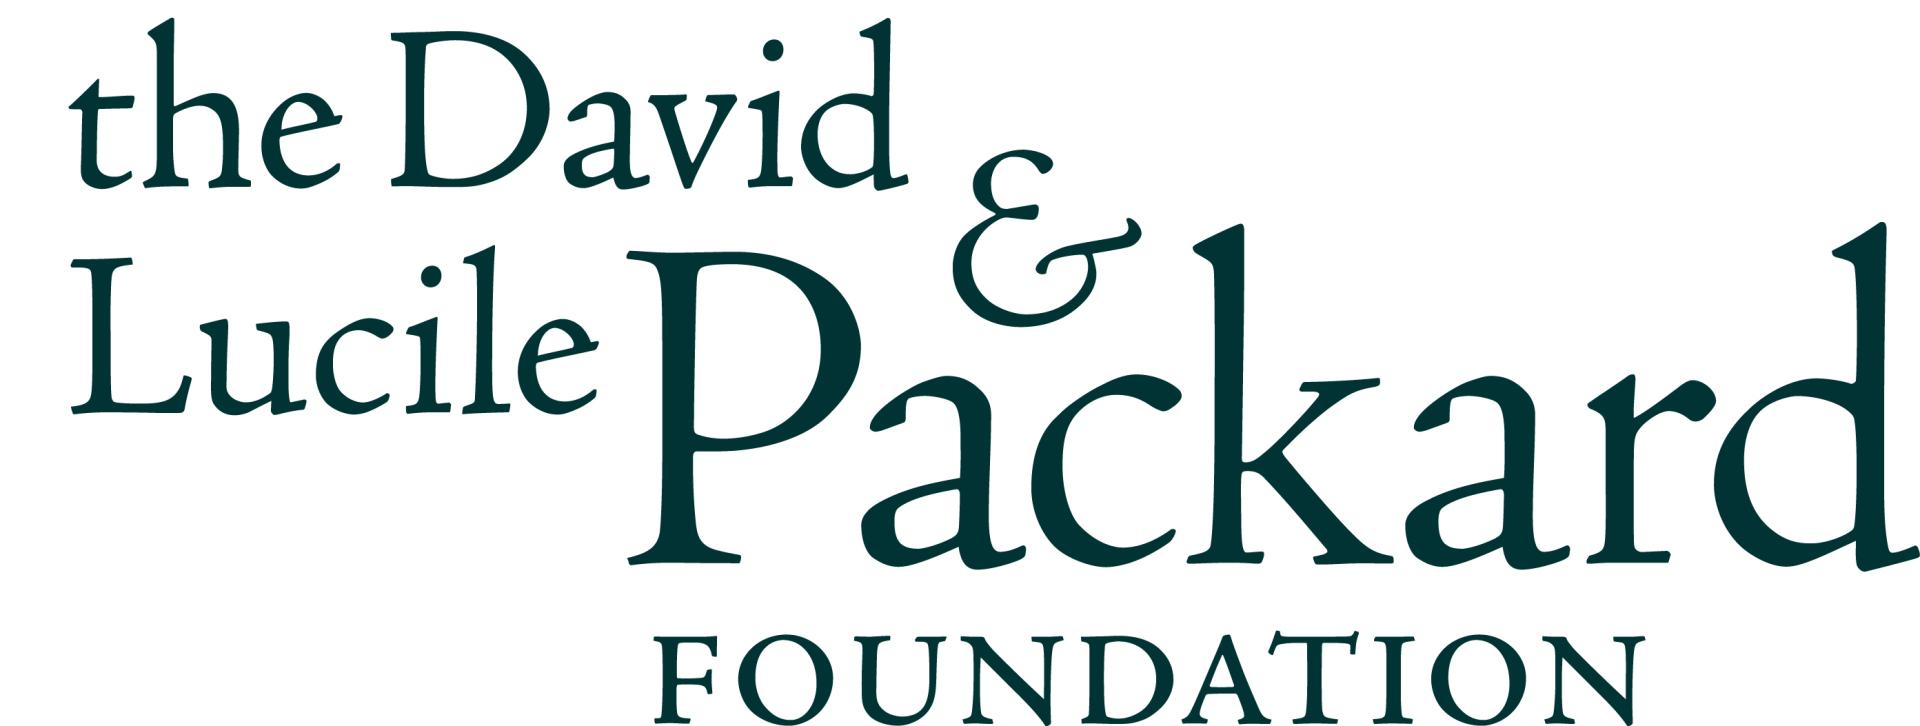 packard-foundation-logo.jpg